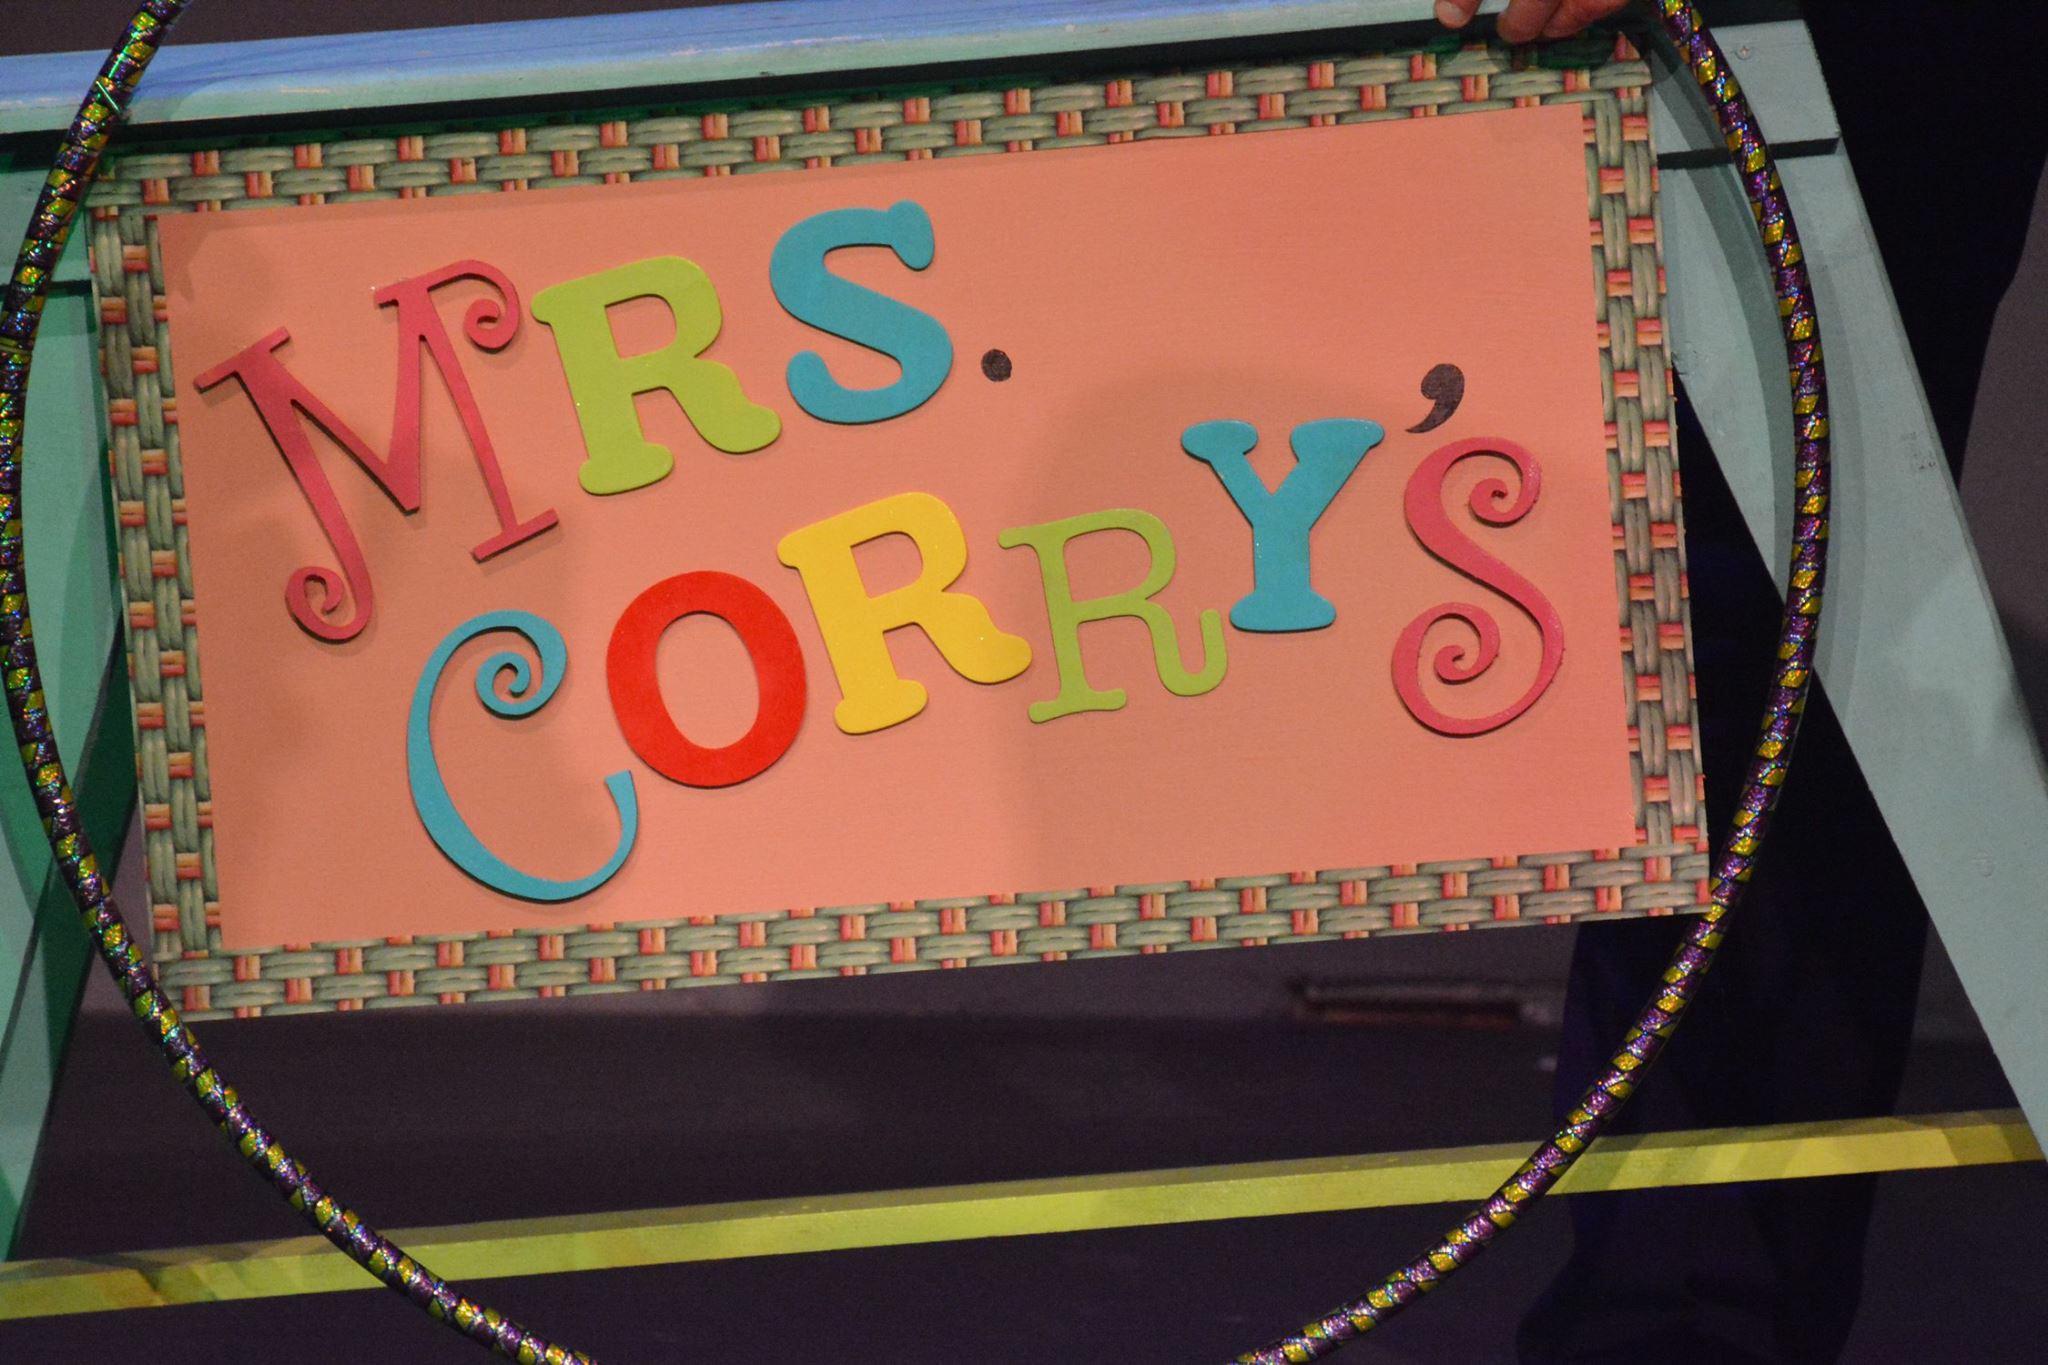 mrs. corry's sign.JPG